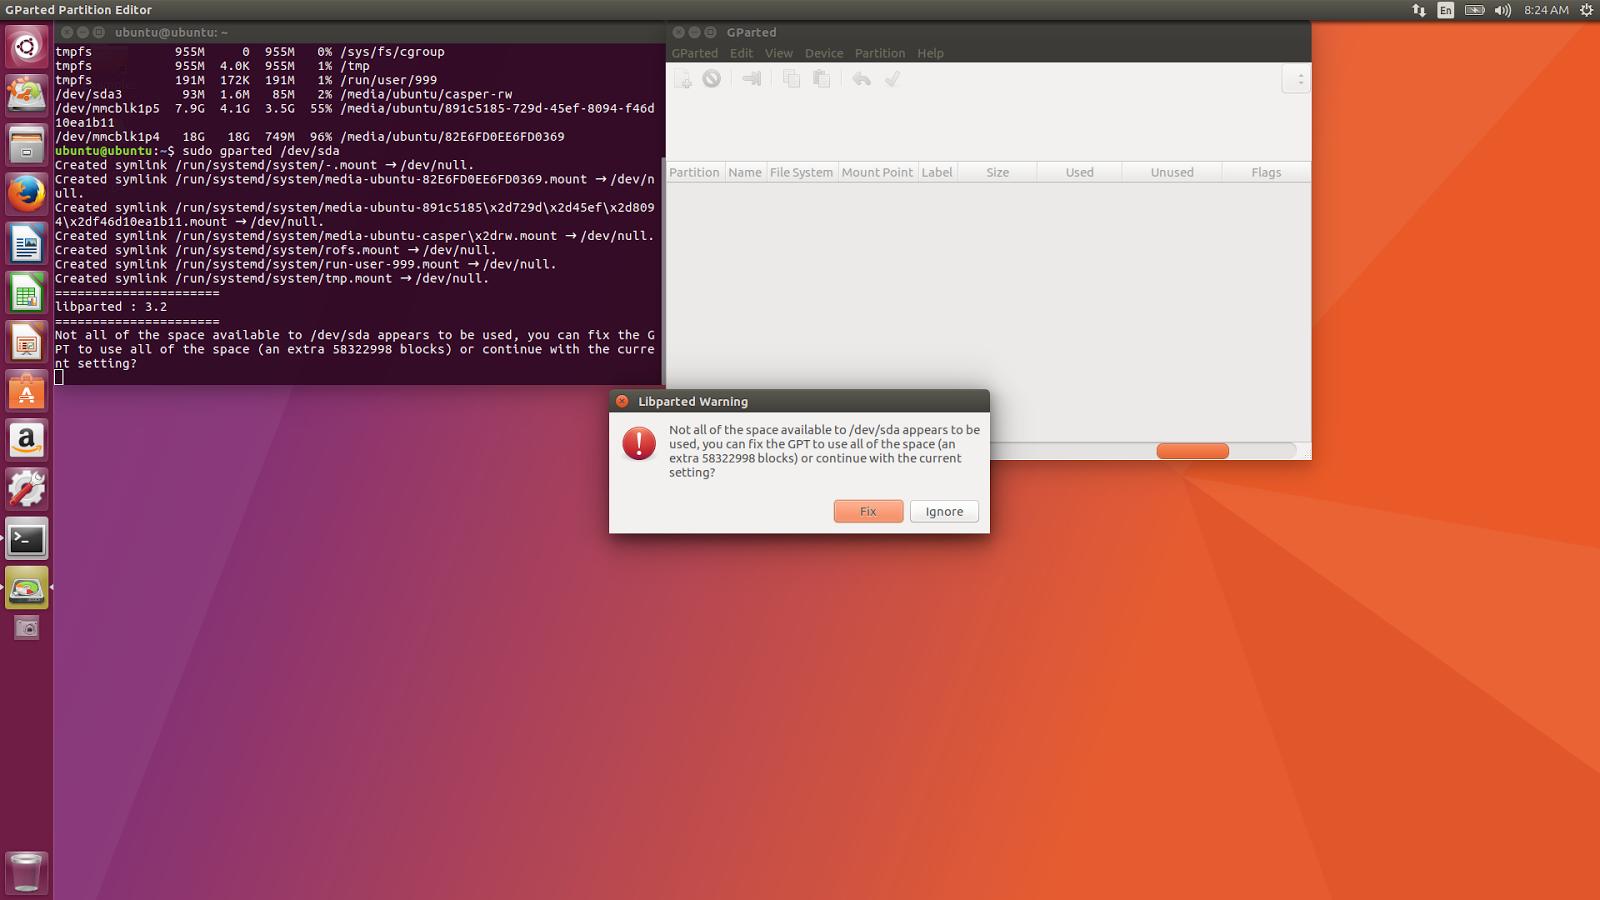 linuxium com au: Creating personalized Ubuntu, Mint and Debian ISOs